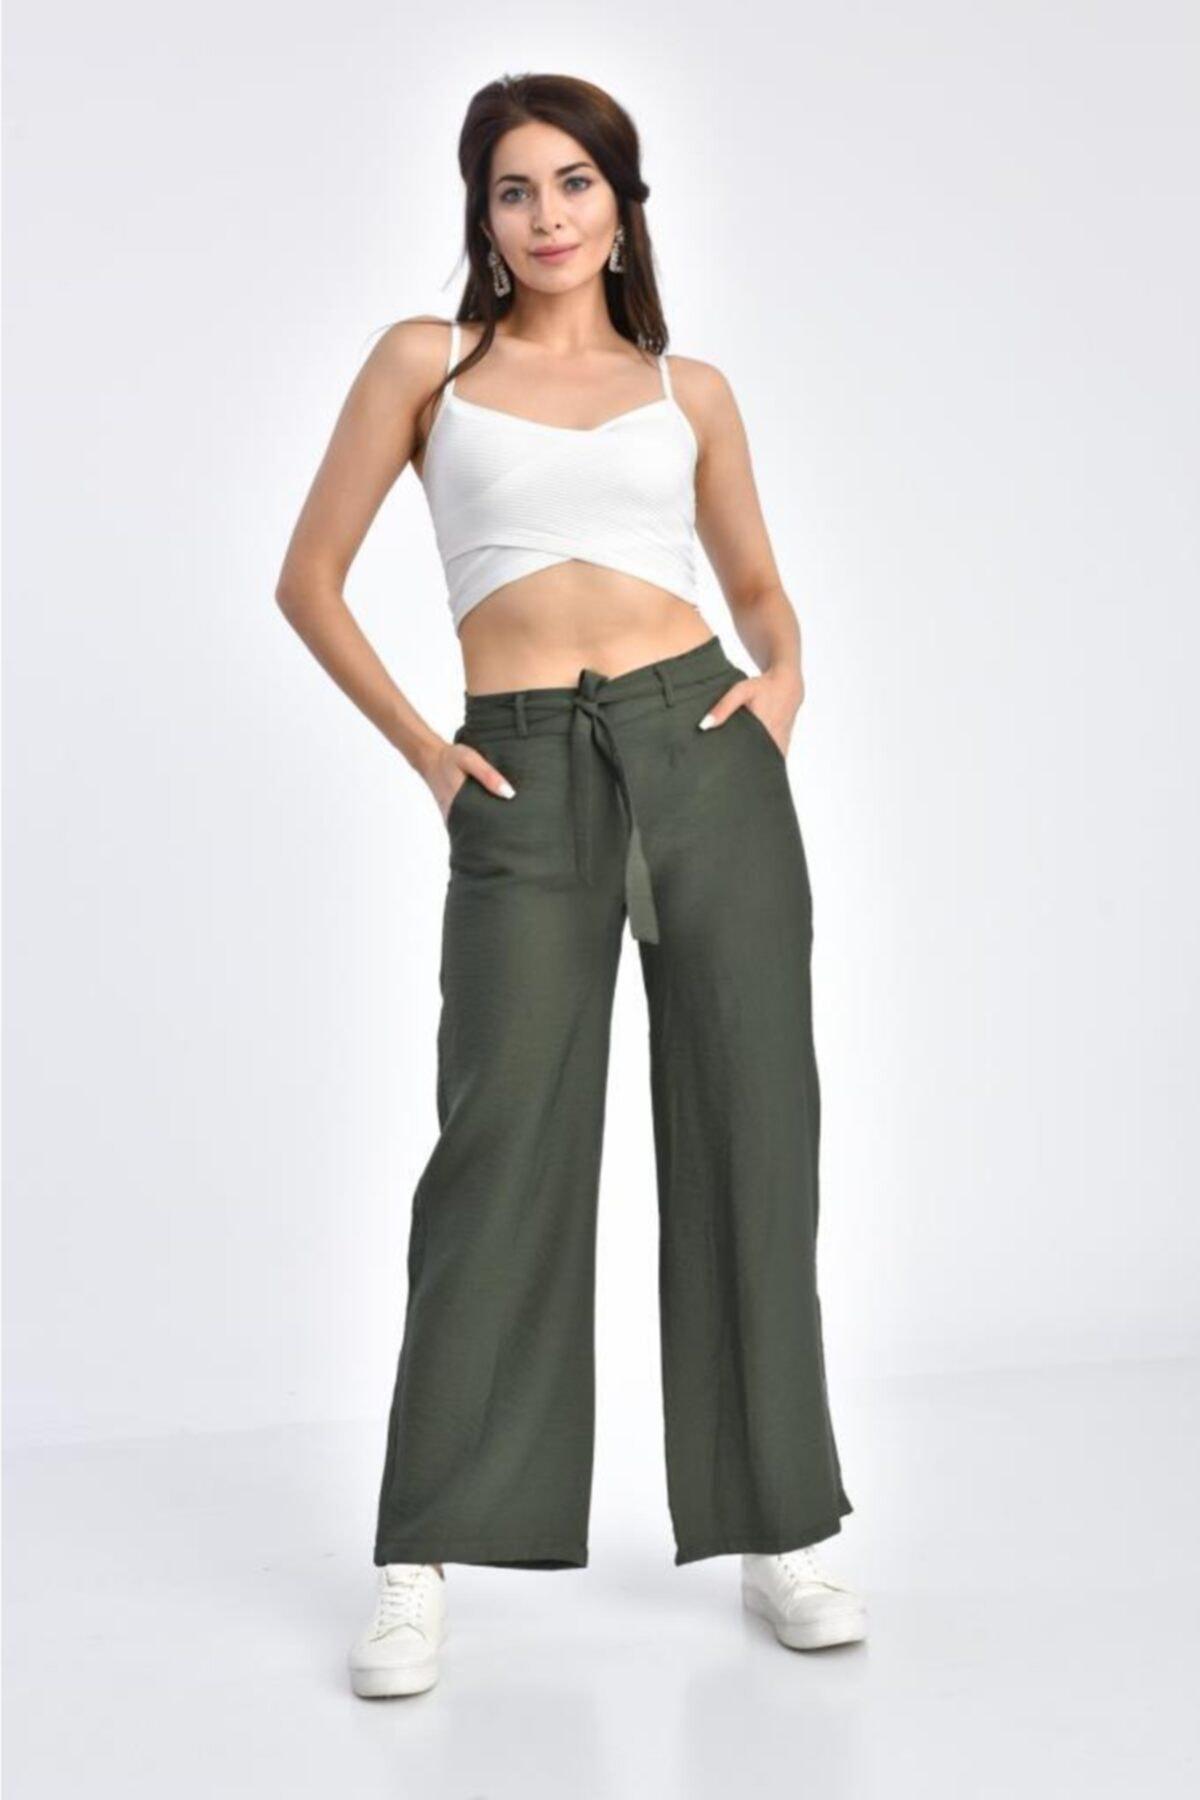 Modkofoni Haki Pantolon Belden Lastikli Kuşaklı Bol Paça Haki Keten Pantolon 1